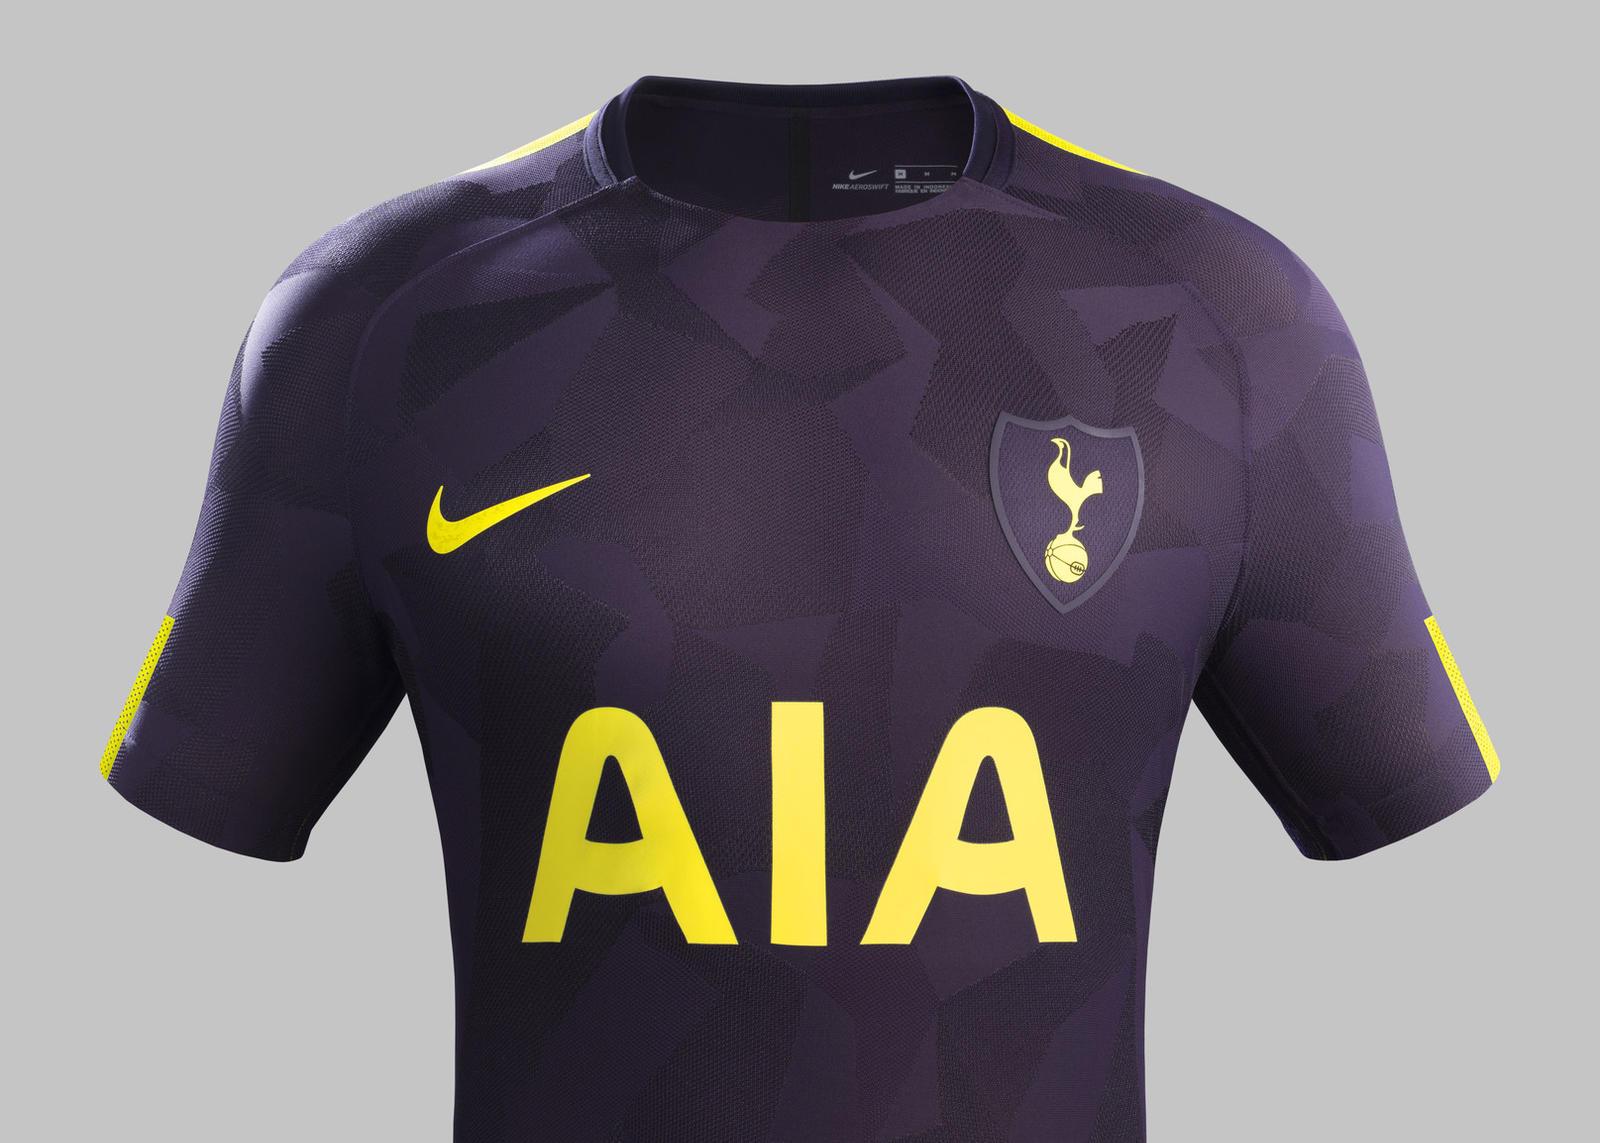 classic fit 00c1e 0c67d Tottenham Hotspur Unveils Dazzle Camo Third Kit - Nike News